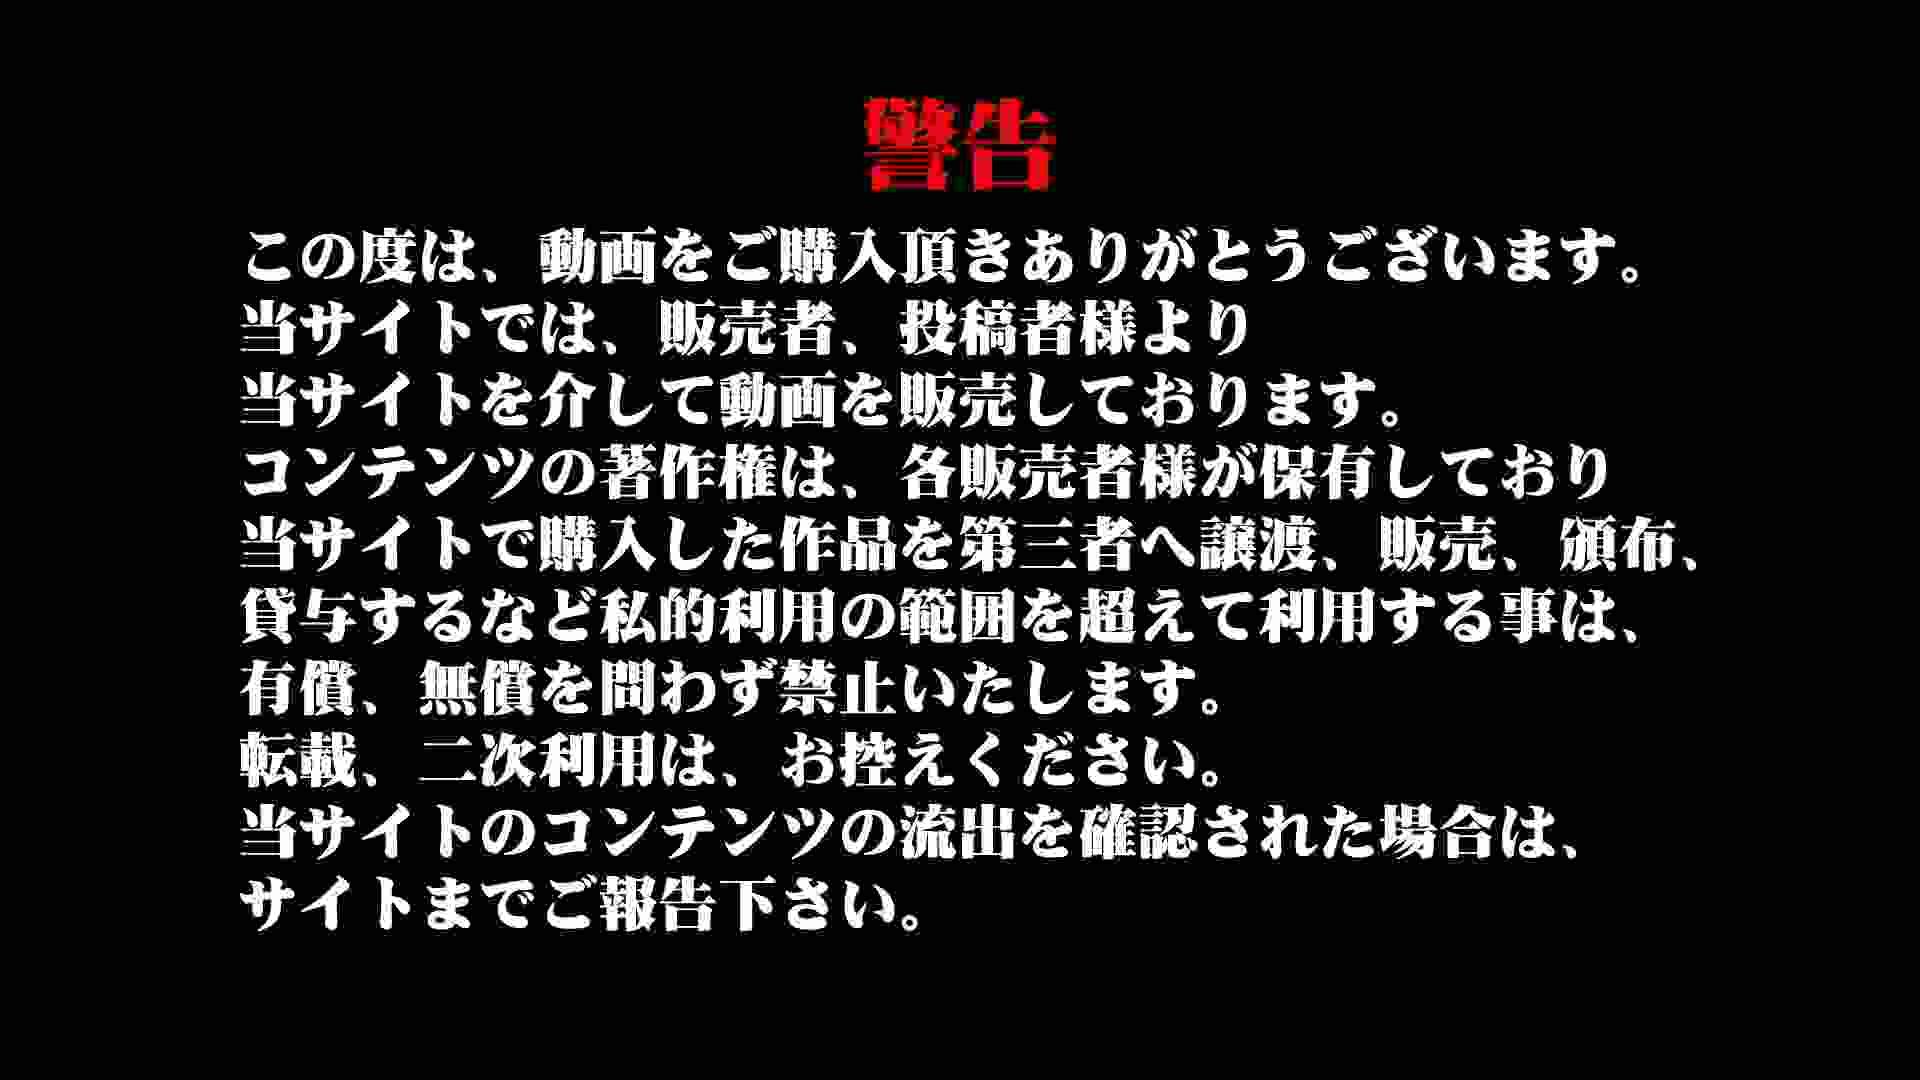 Aquaな露天風呂Vol.895 盗撮師作品  70pic 3